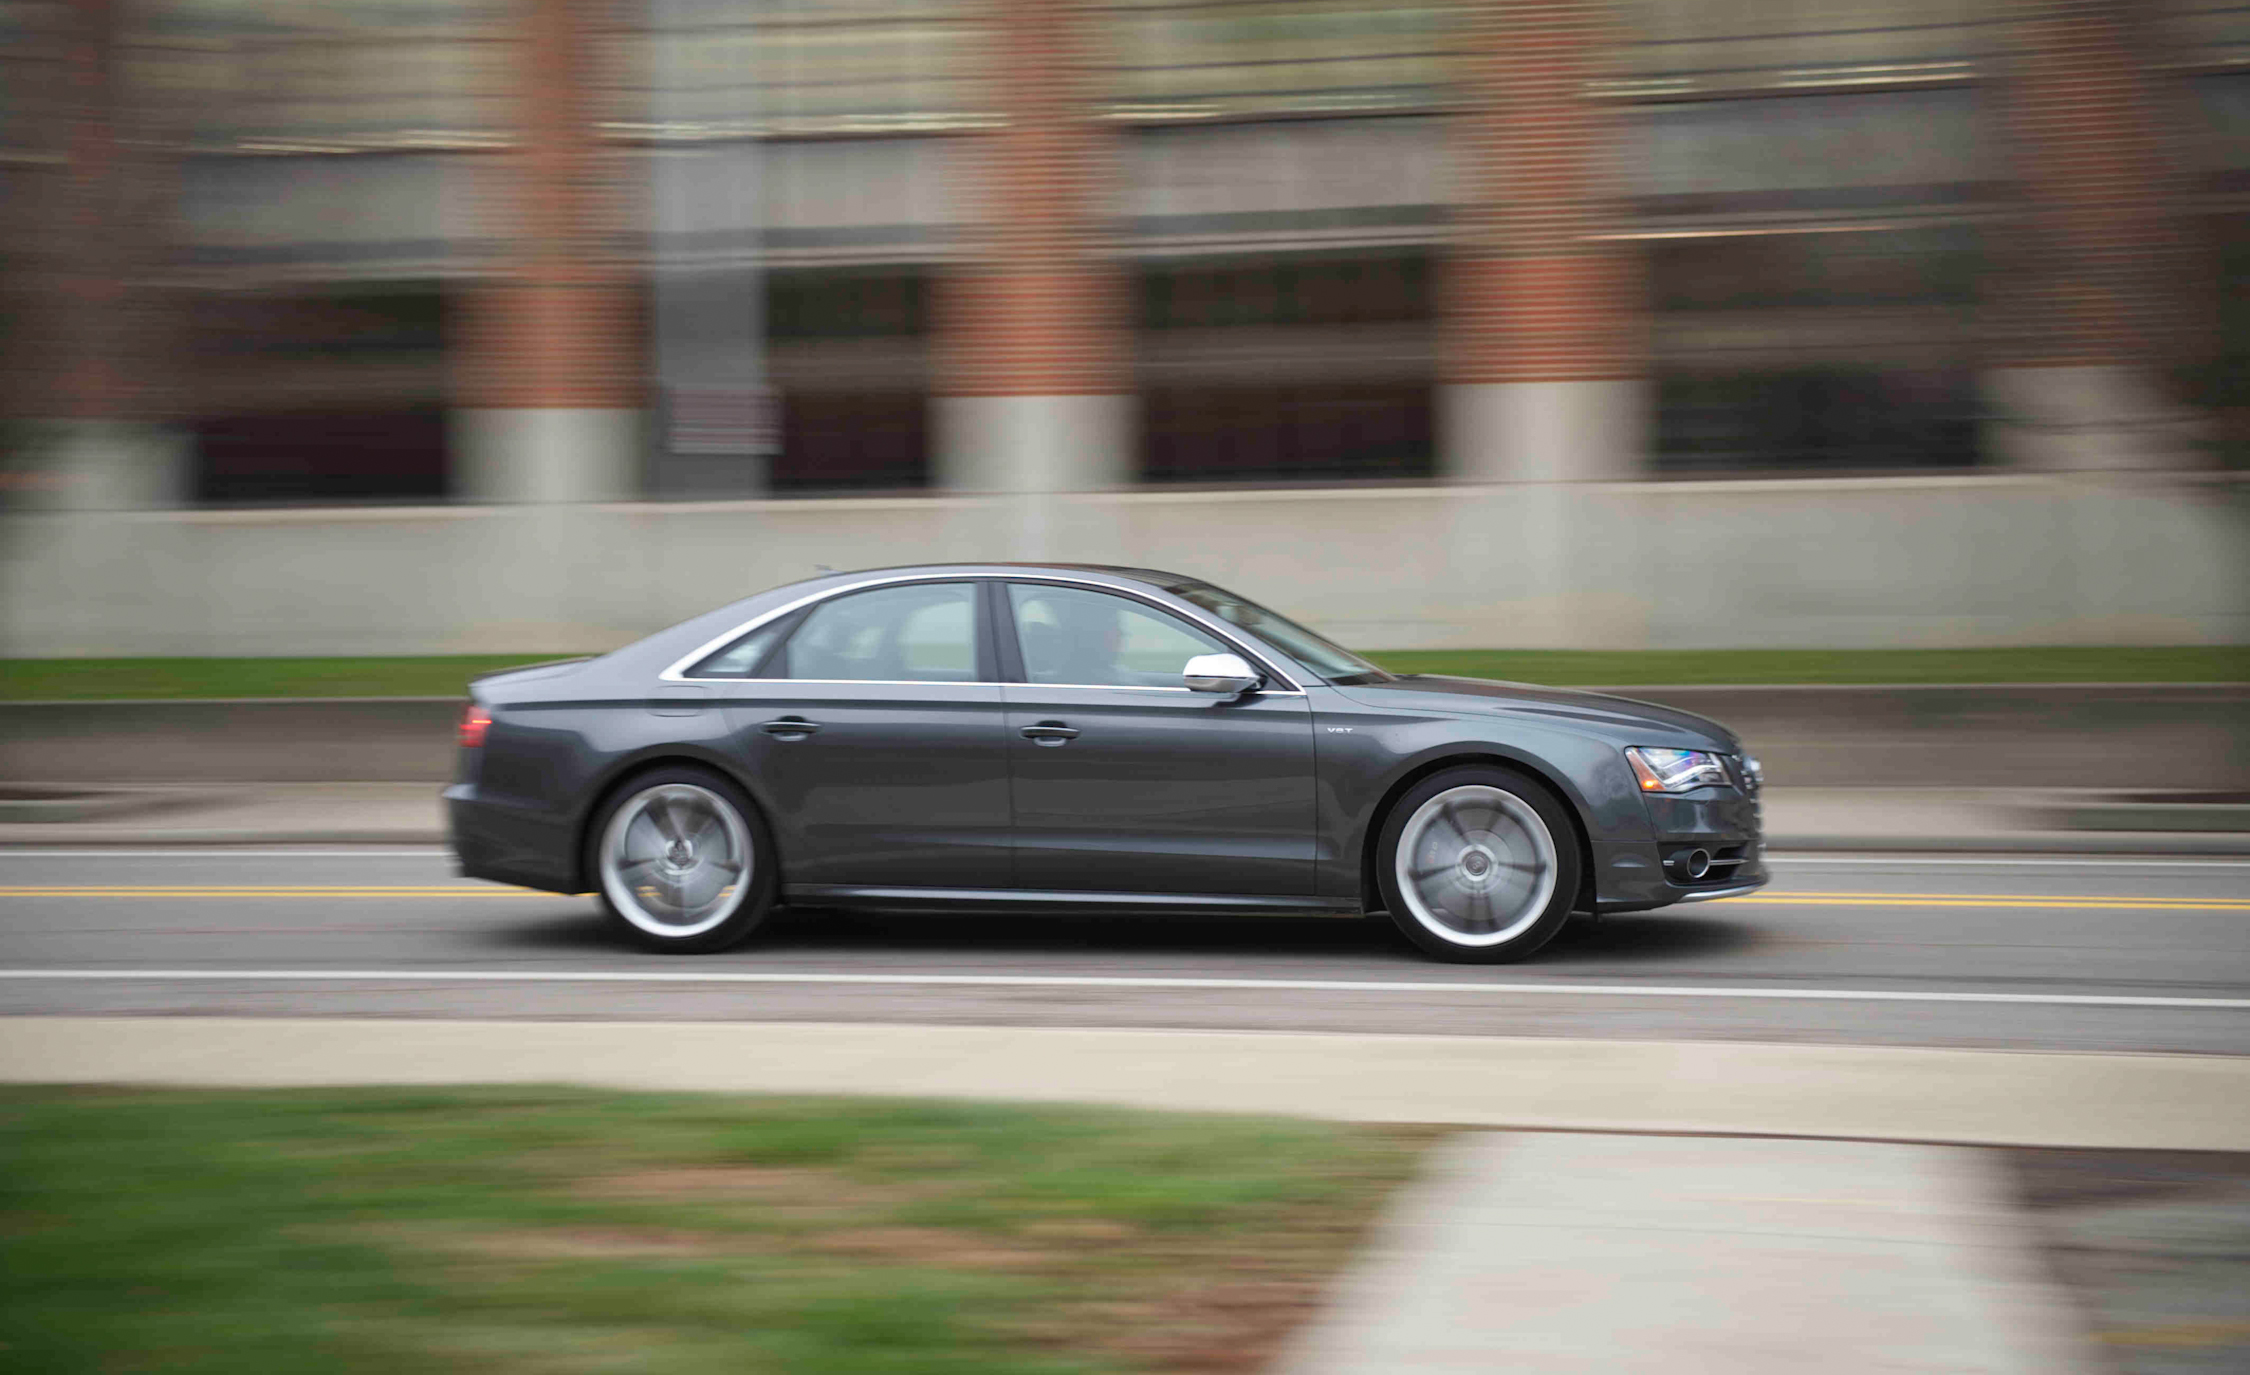 2013 Audi S8 Grey Metallic (Photo 10 of 25)